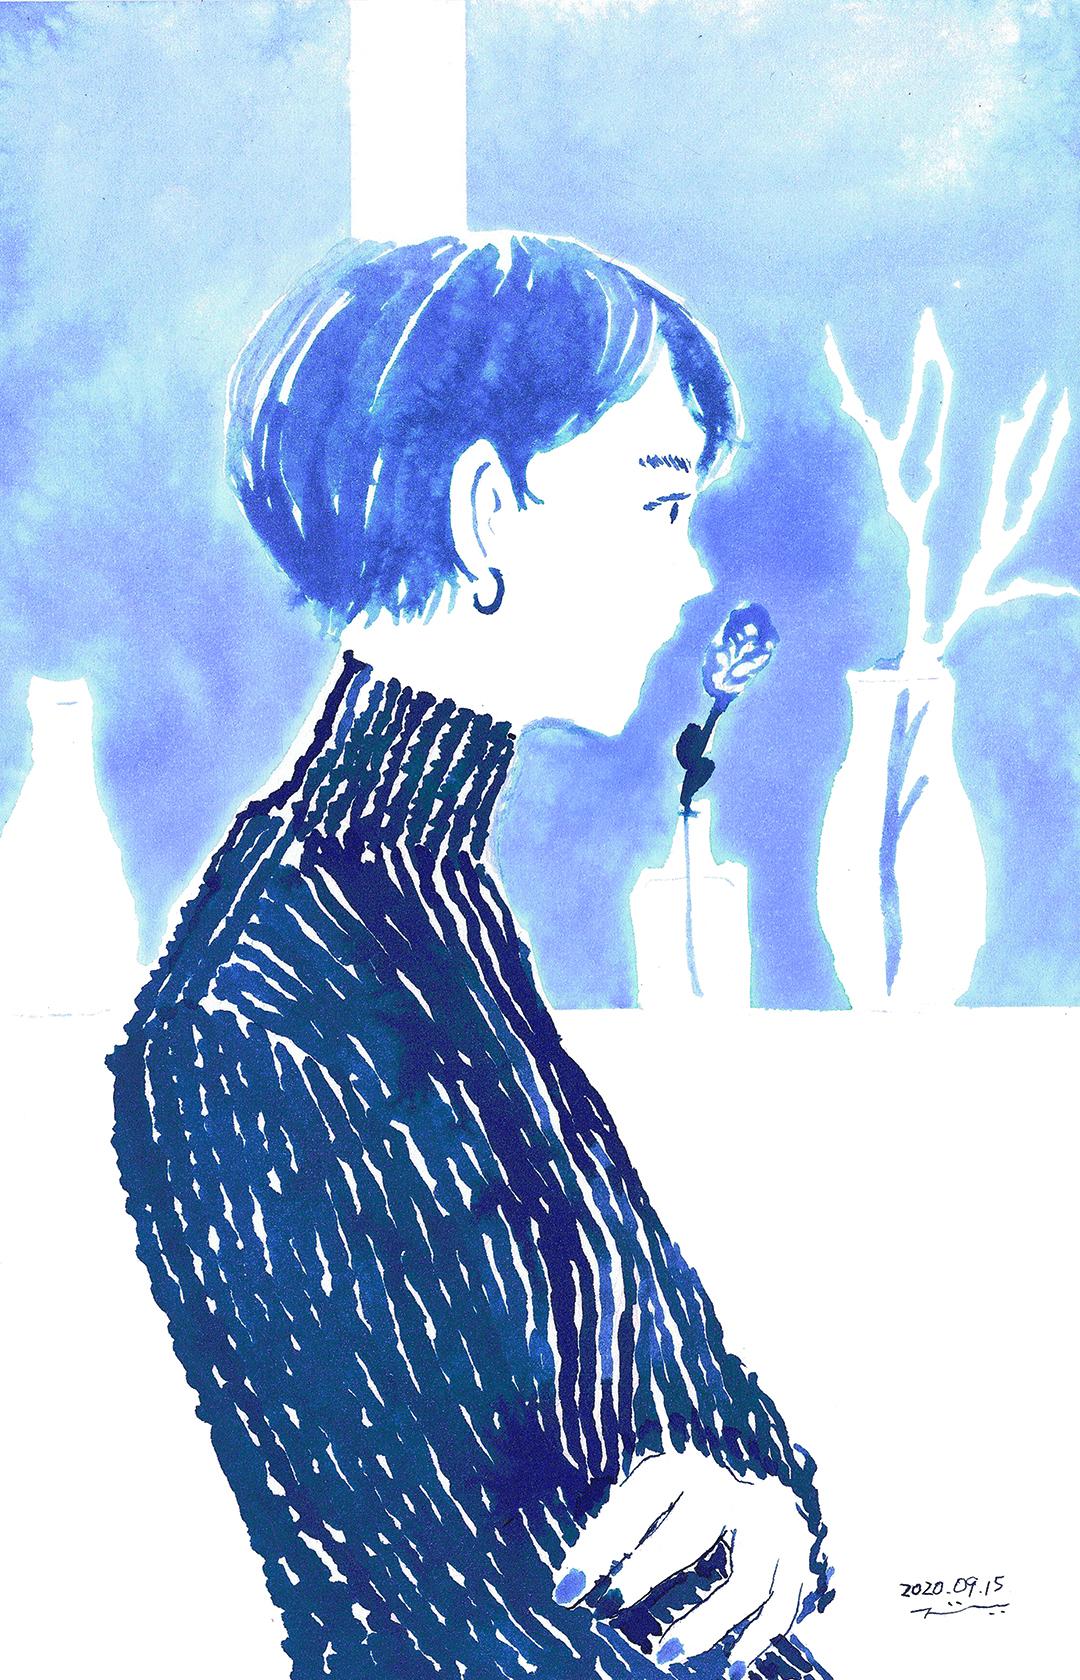 GirlsclubAsia-Illustrator-Sayuri Fujimaki-06